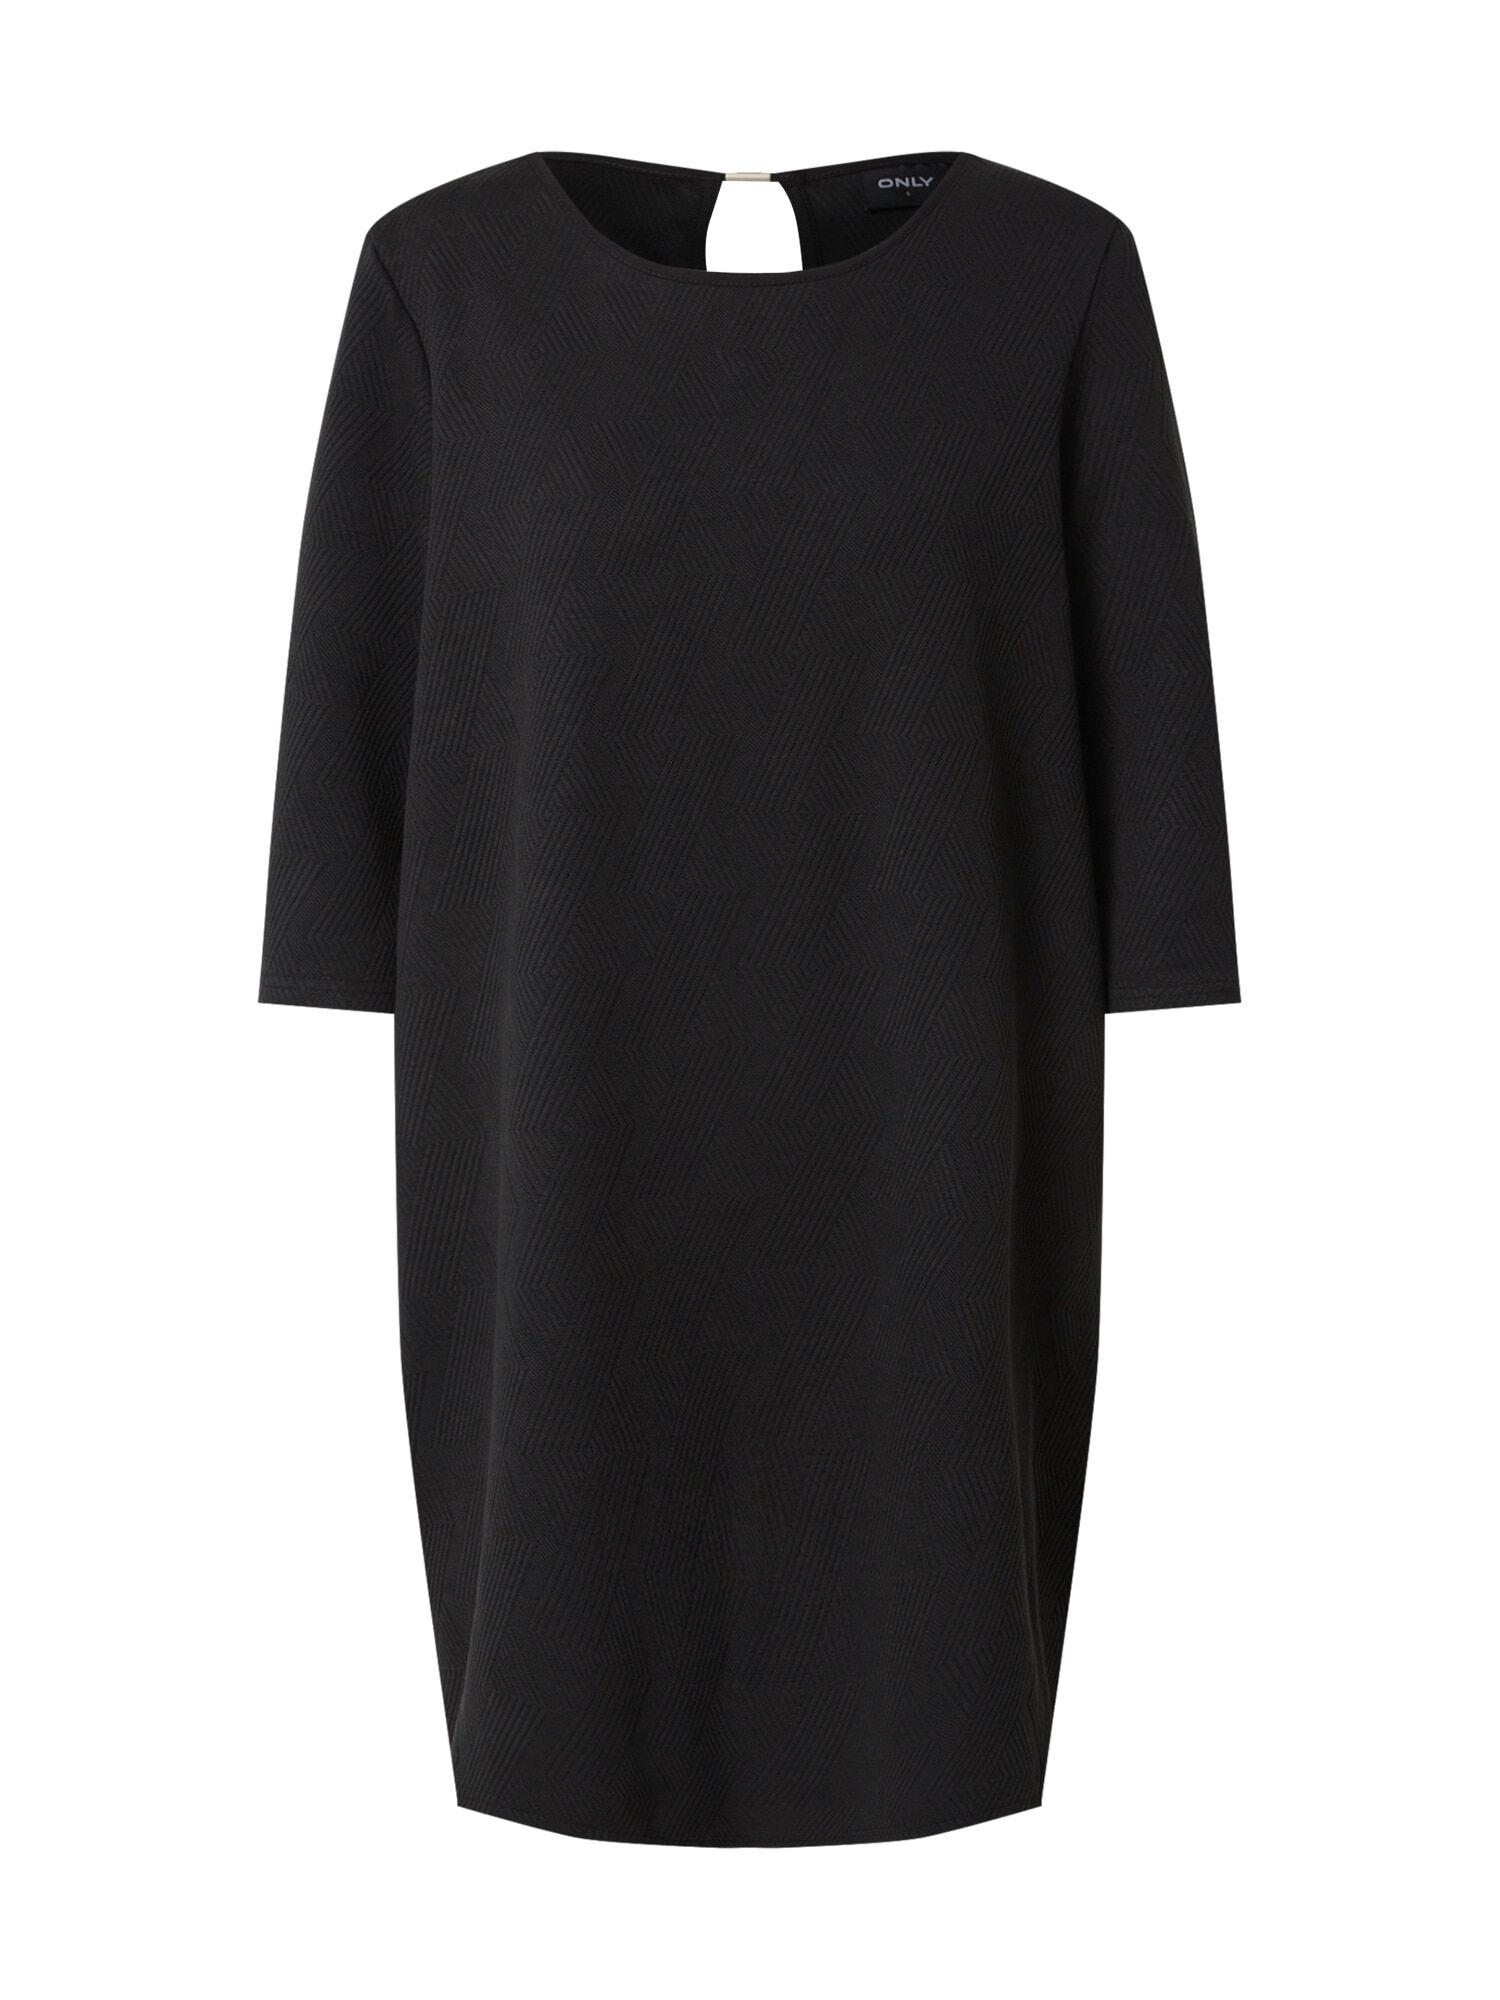 ONLY Robe 'SOJA'  - Noir - Taille: S - female